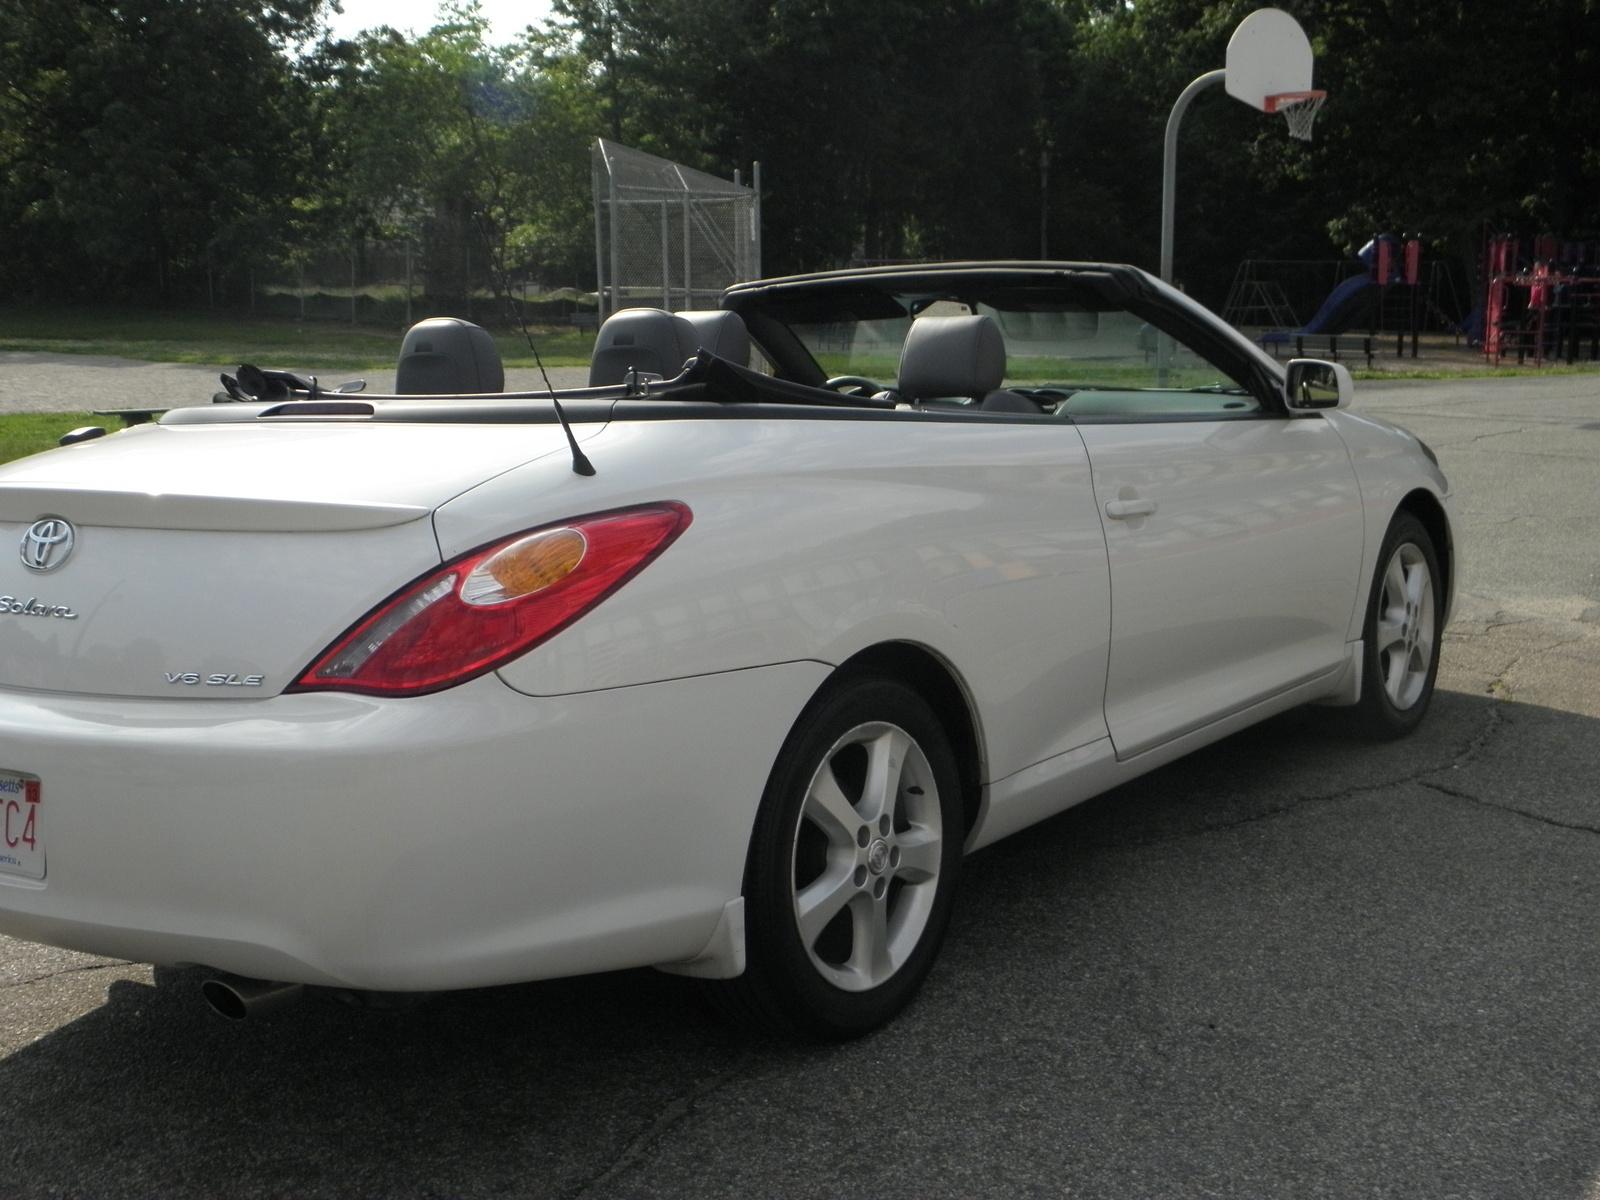 2008 Toyota Camry Solara Sle Convertible For Sale Cargurus Autos Post